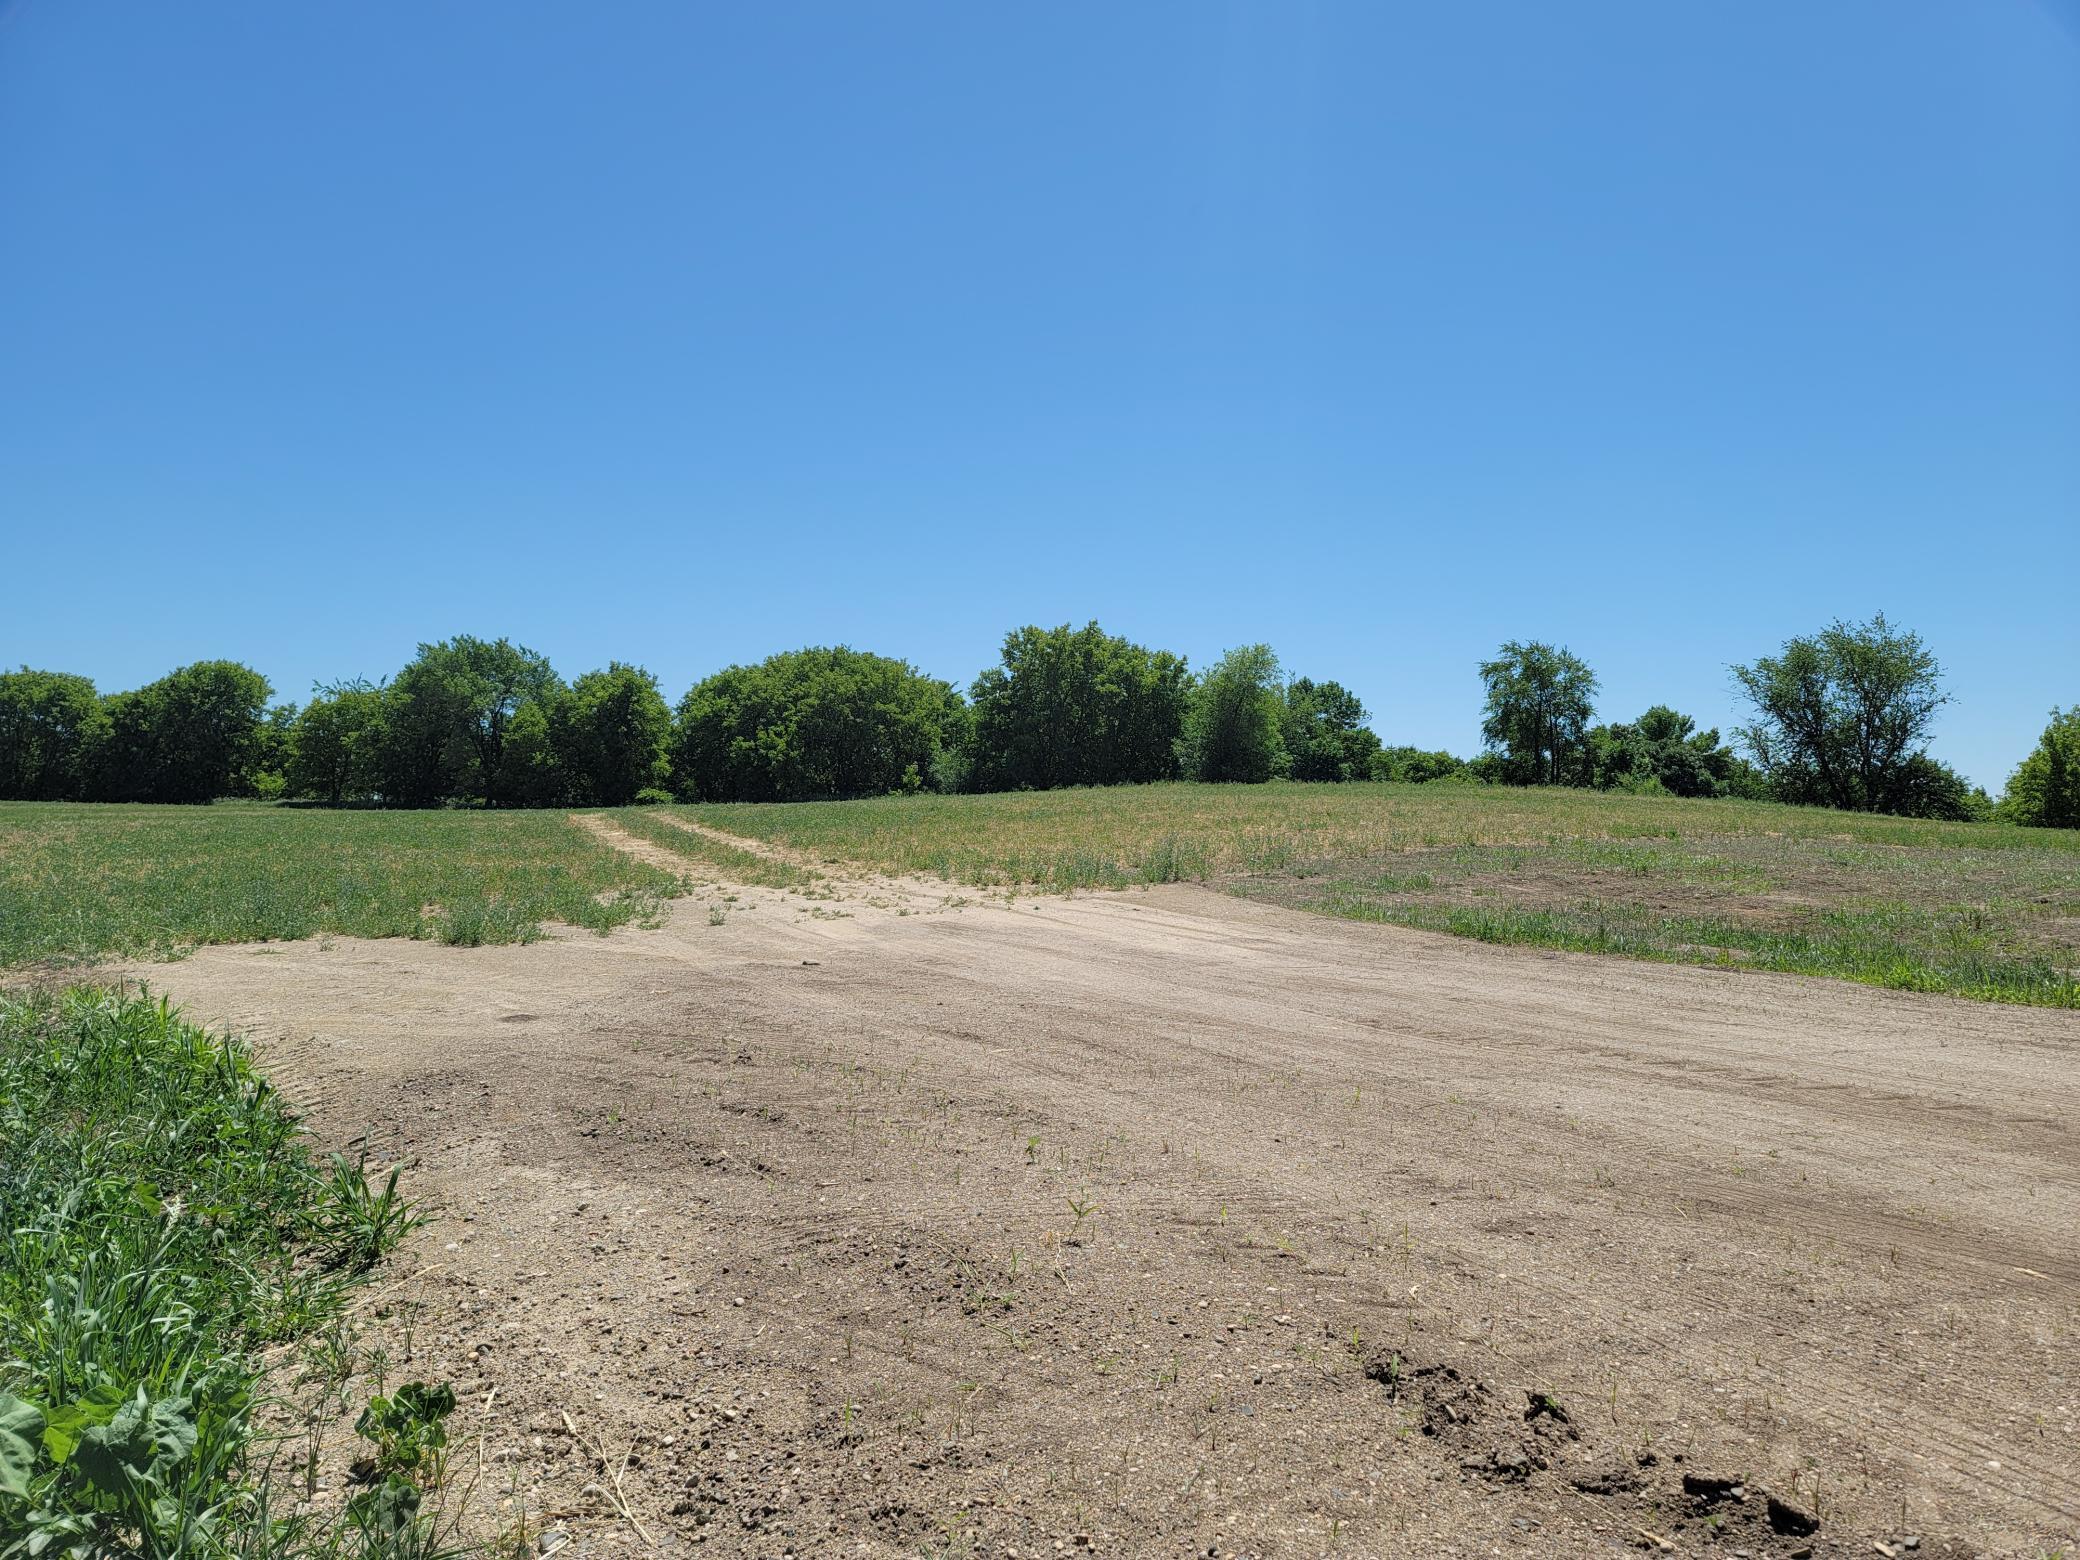 Lot 5 State Highway 15, Kimball MN 55353 - Photo 1